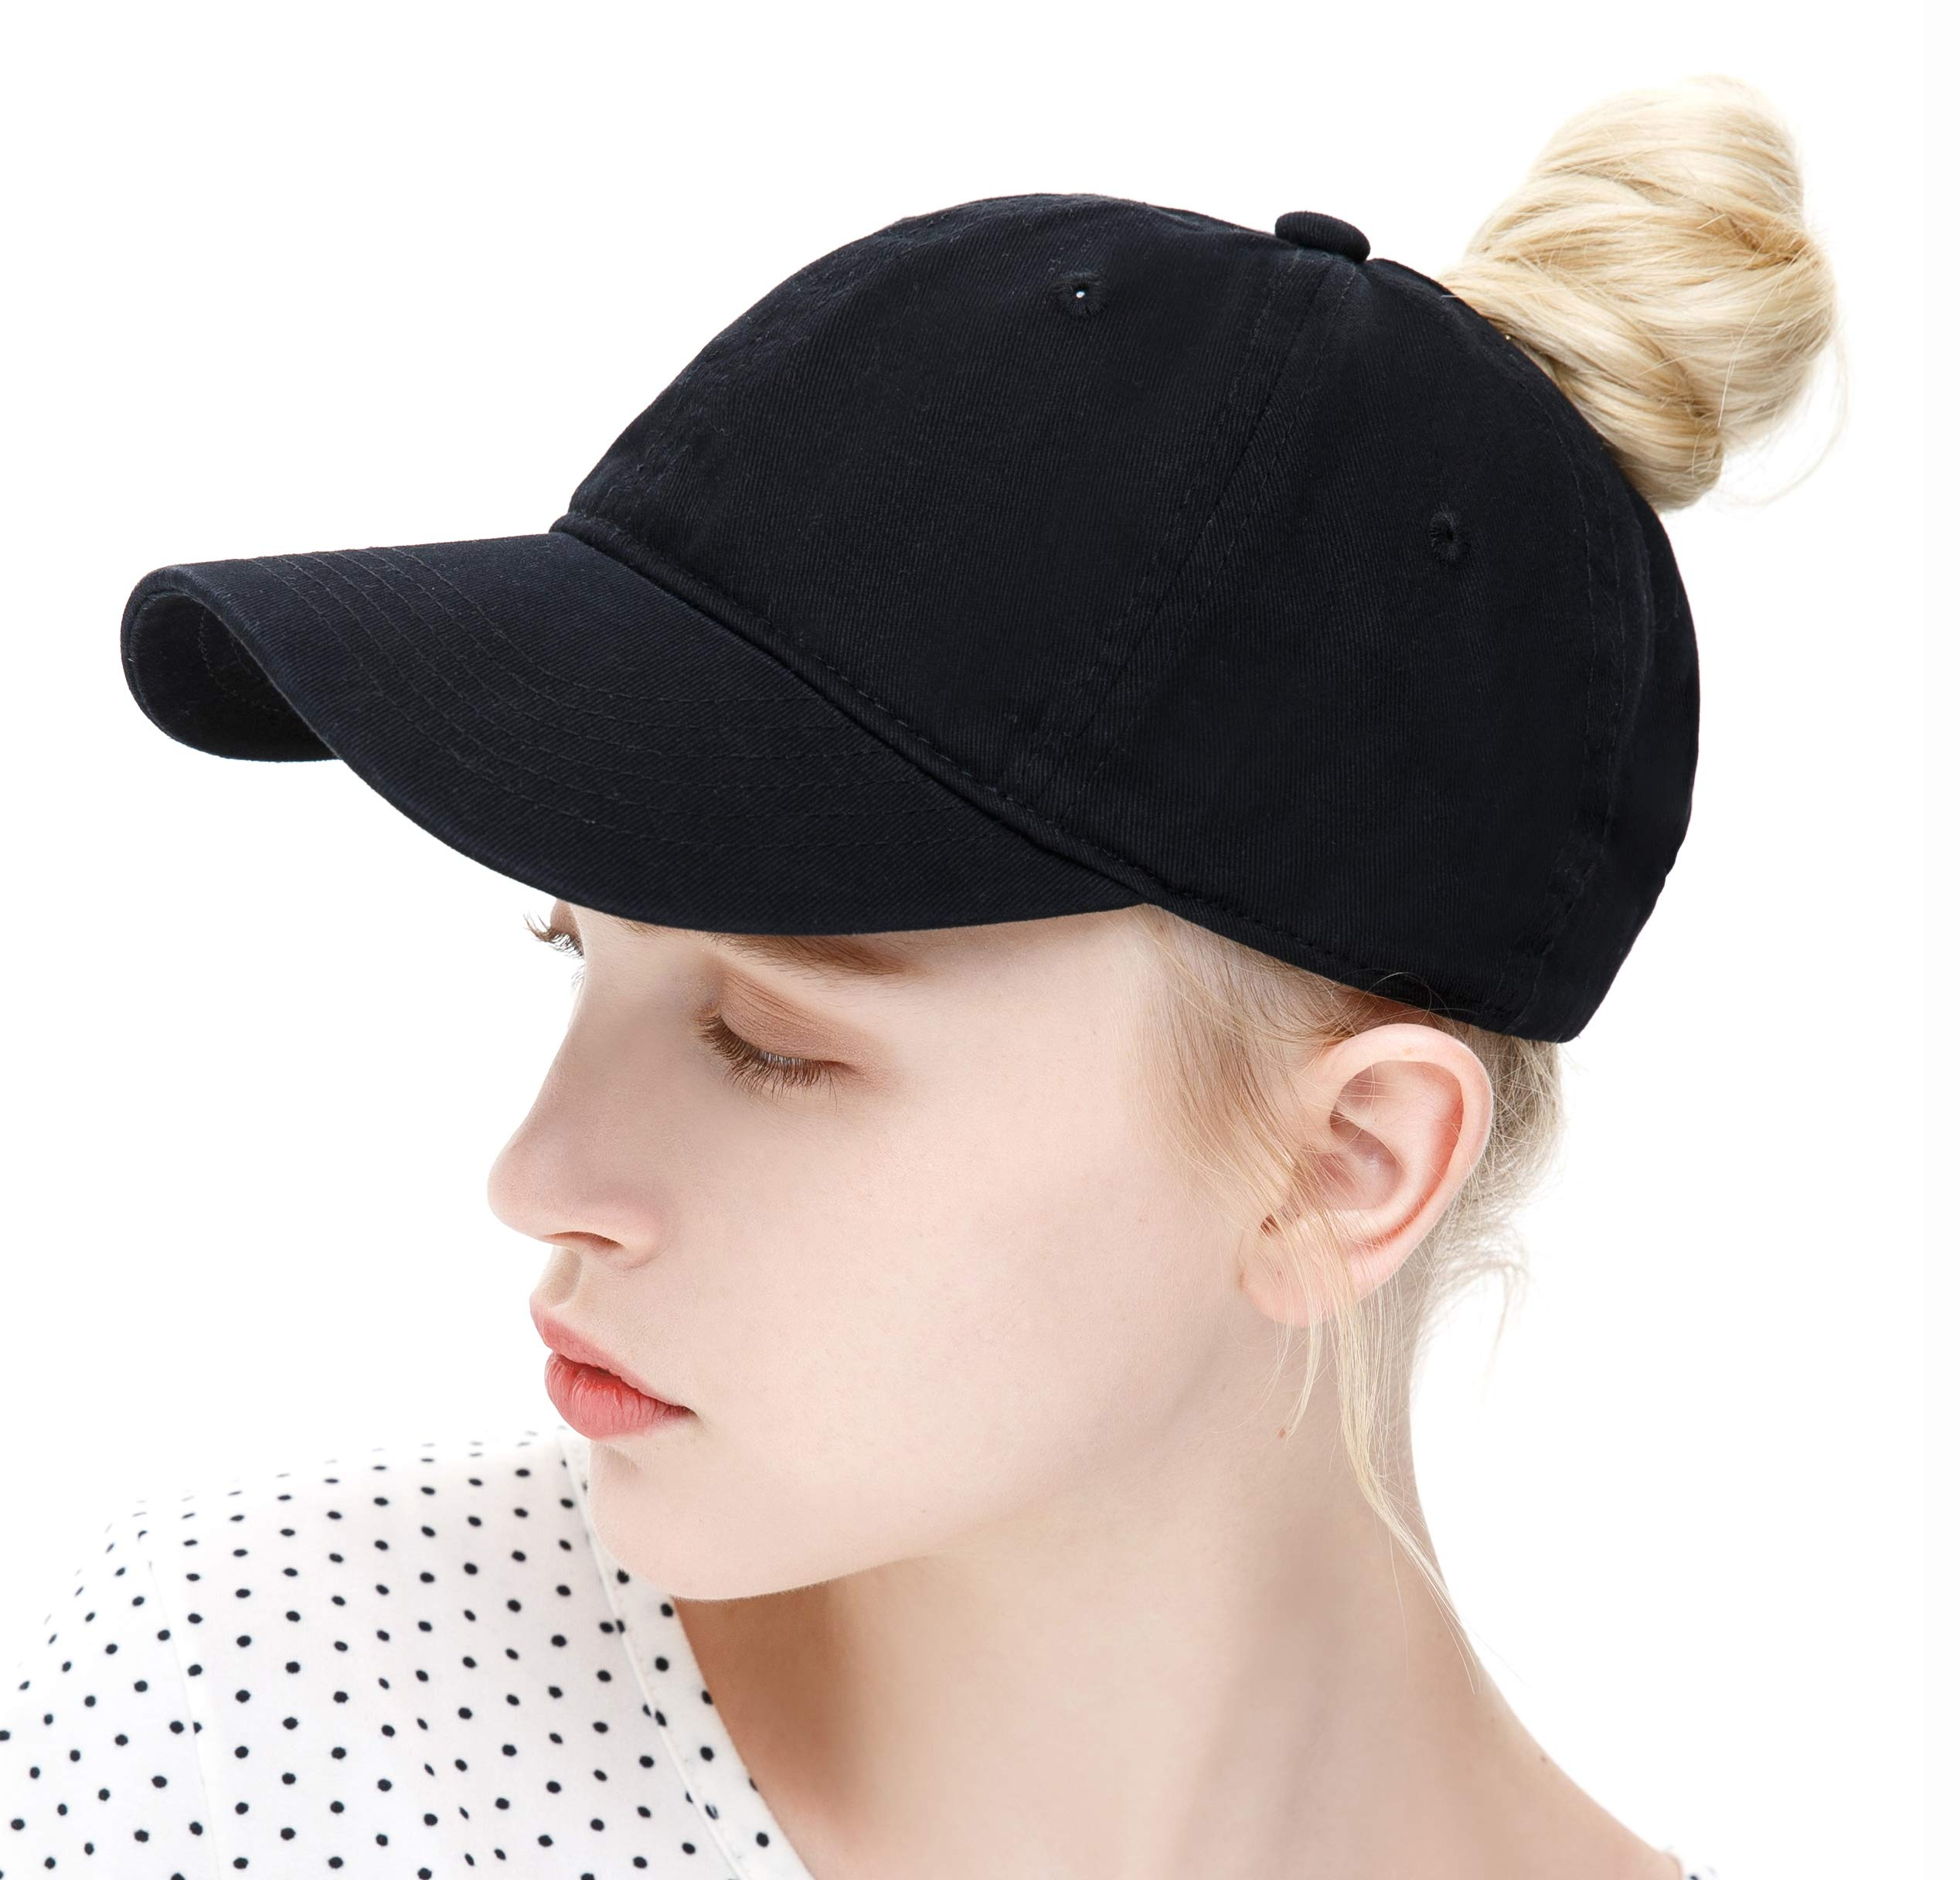 ELLEWIN Ponytail Messy High Bun Hat Ponycaps Adjustable Cotton and Trucker Baseball Cap